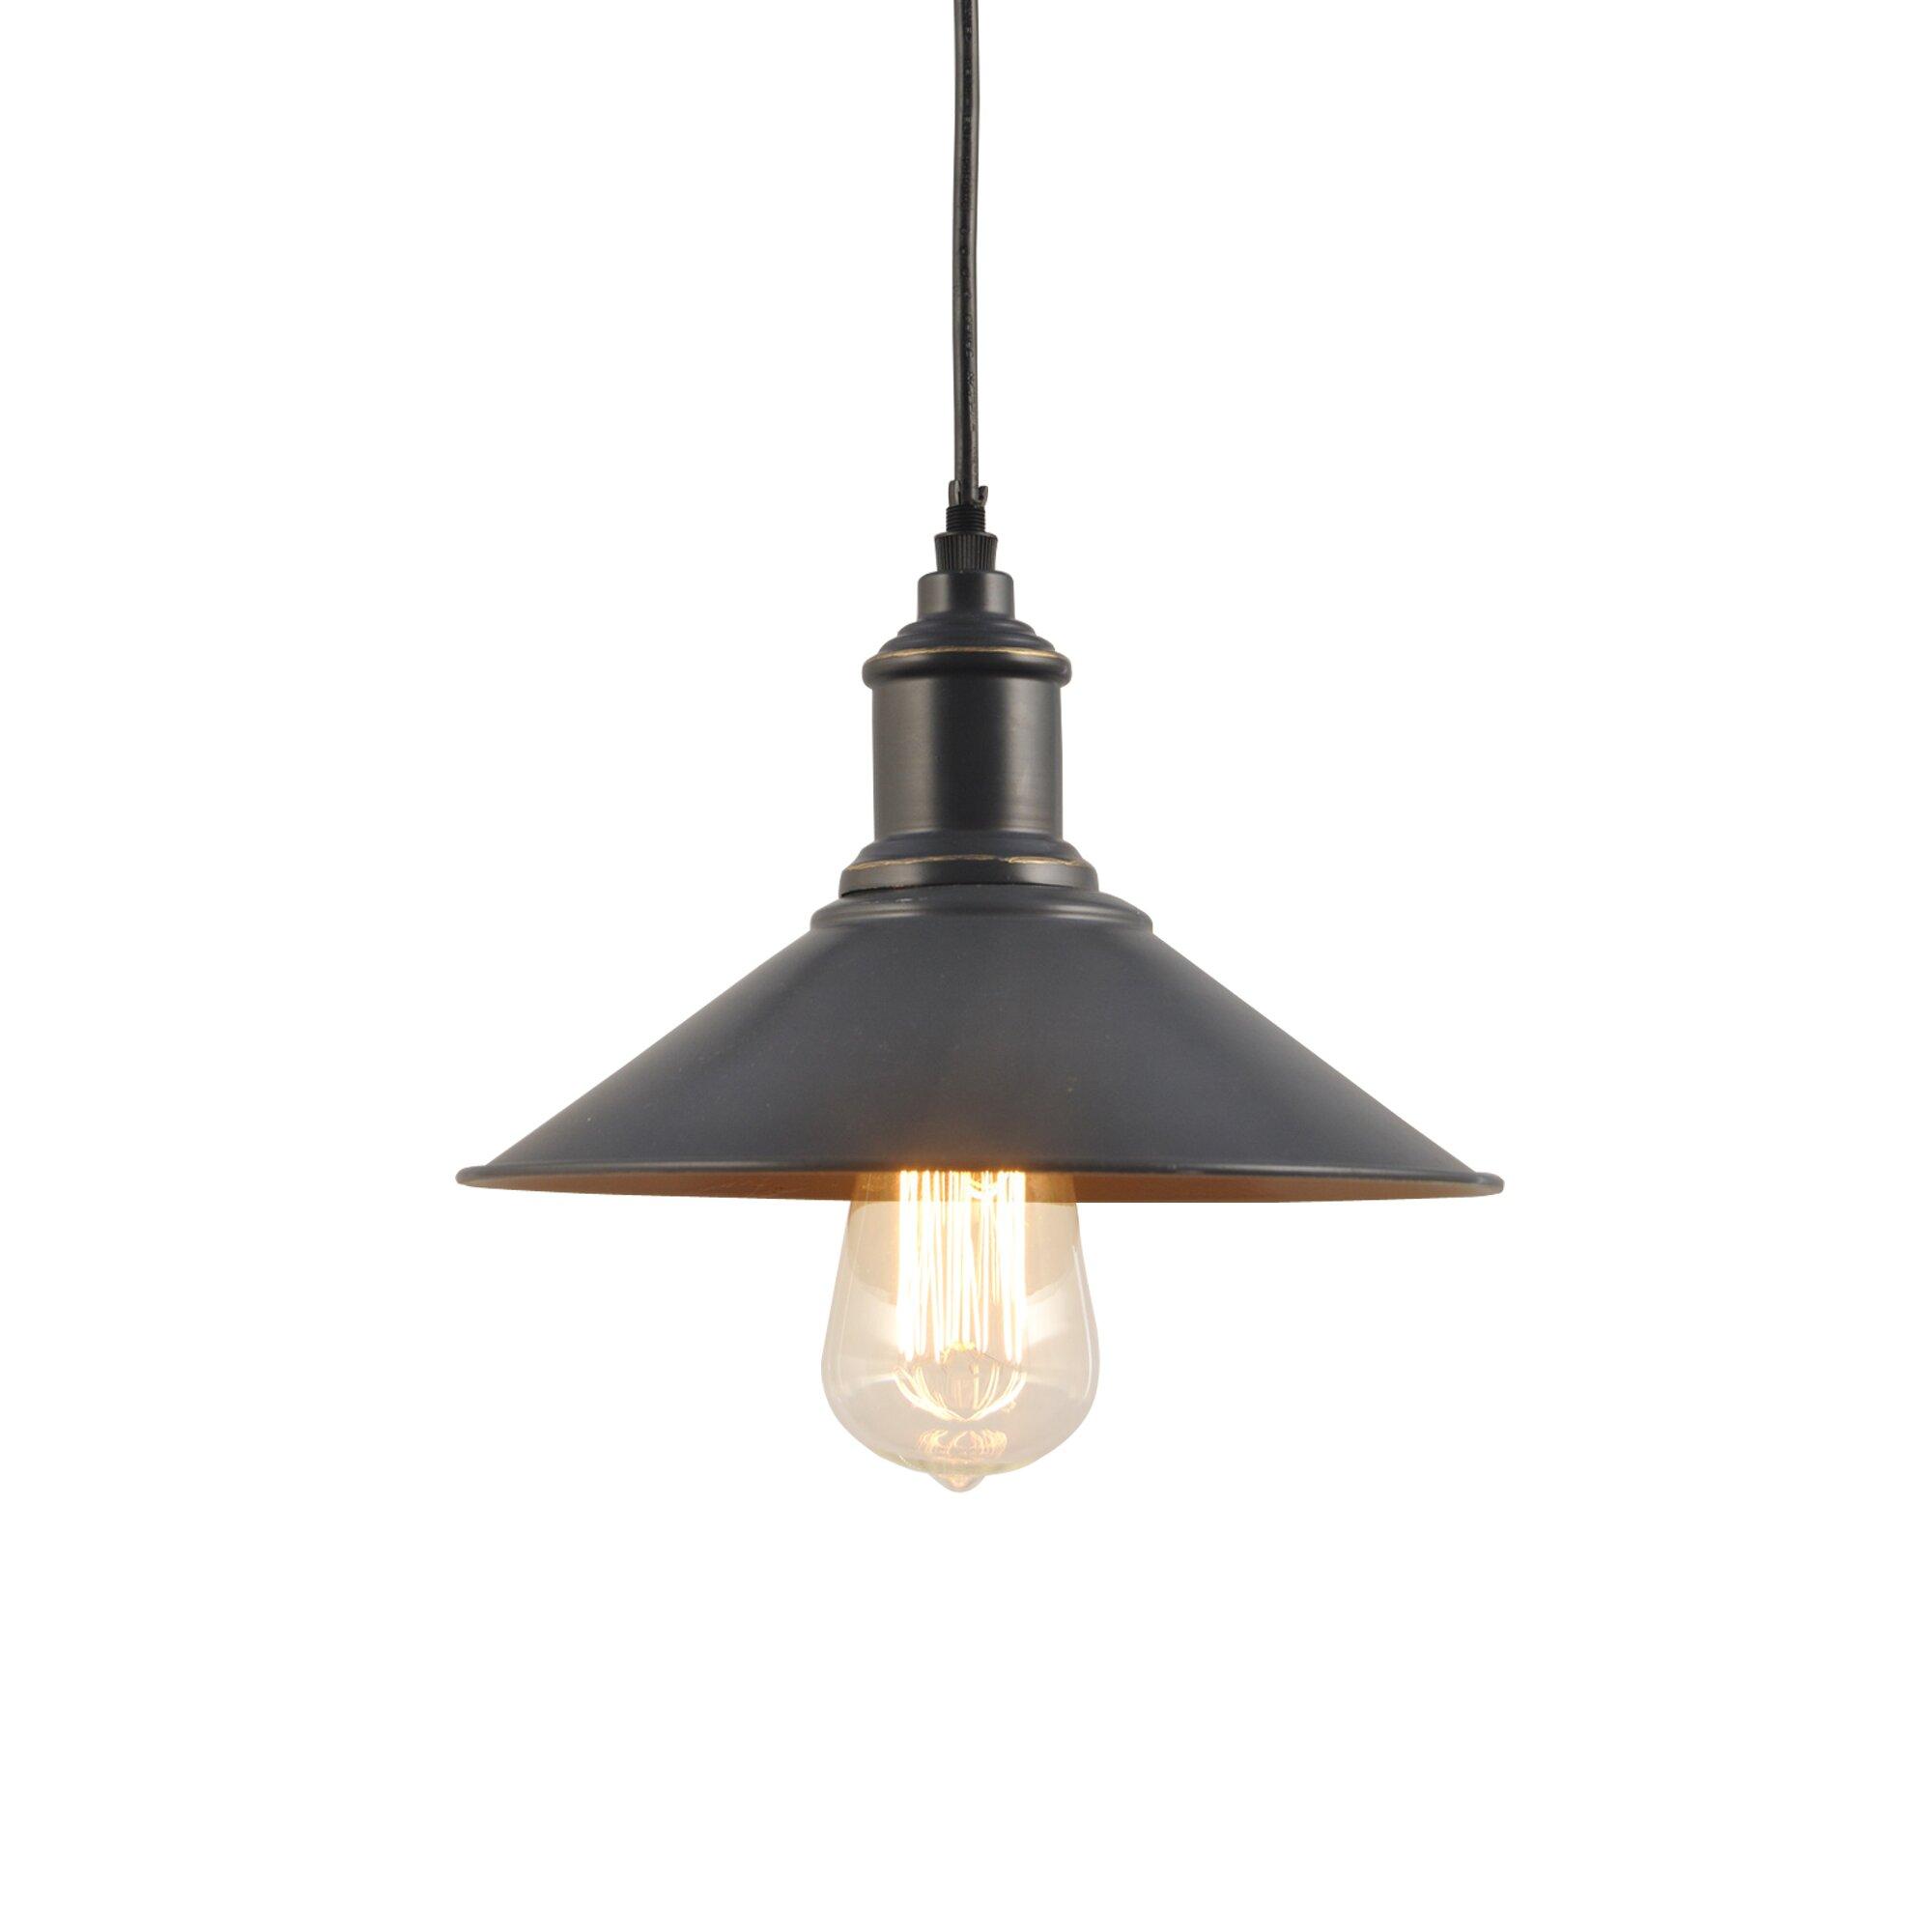 lighting ceiling lights pendants yosemite home decor sku yhd3790